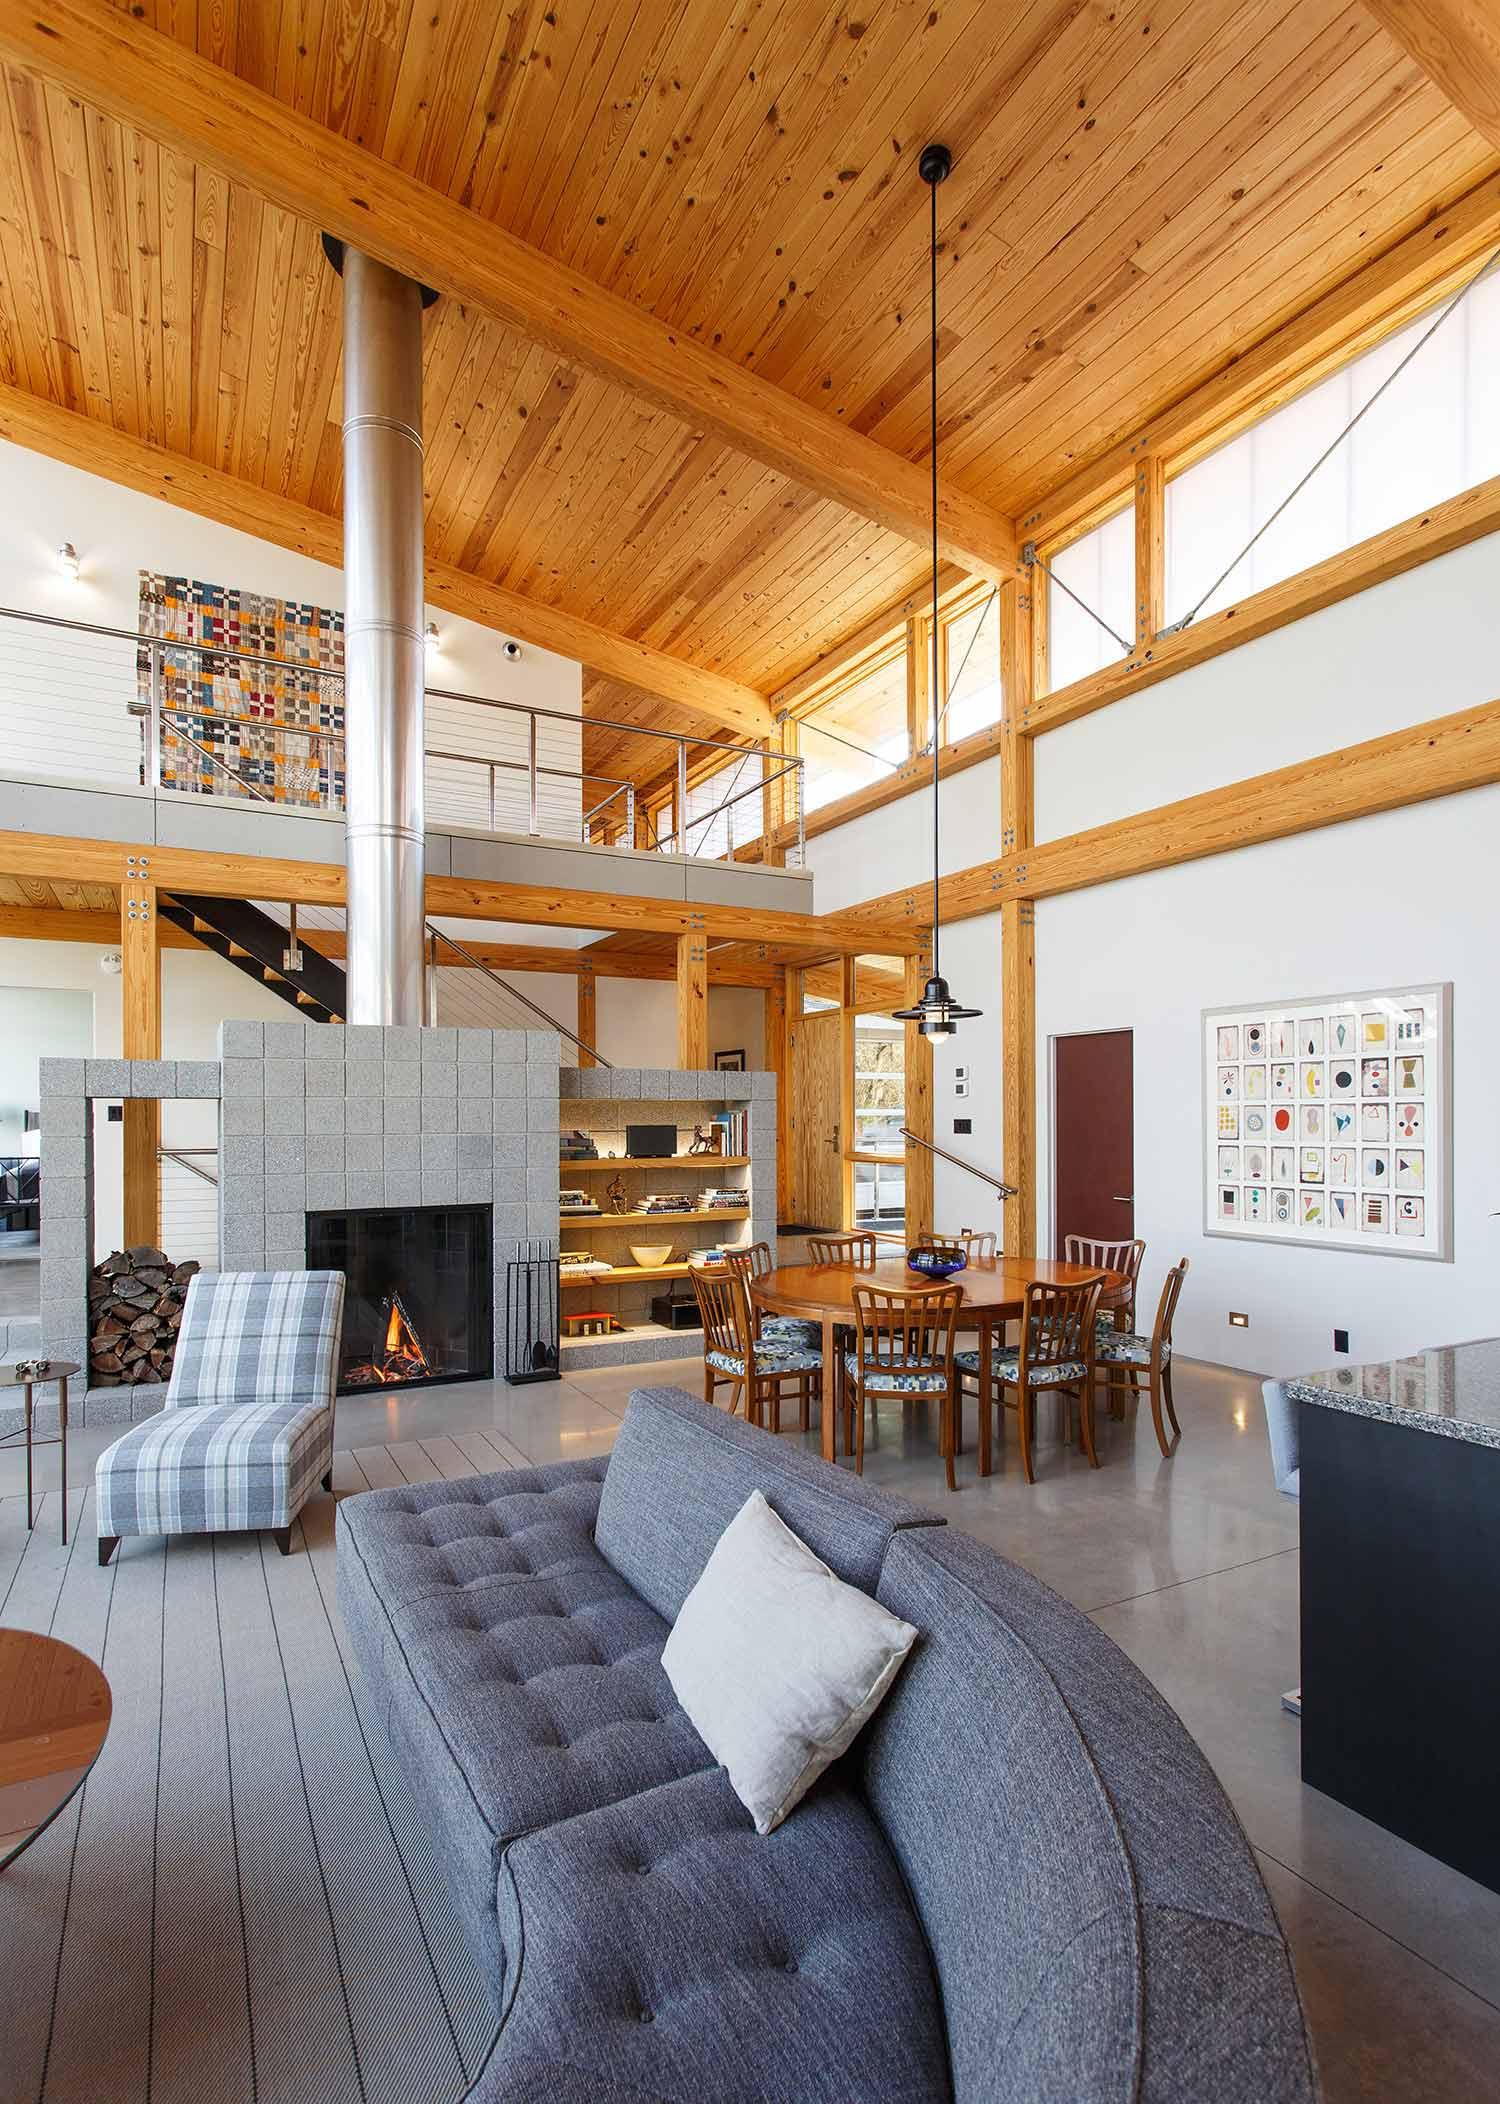 Hugh Lofting Timber Framing Inc.